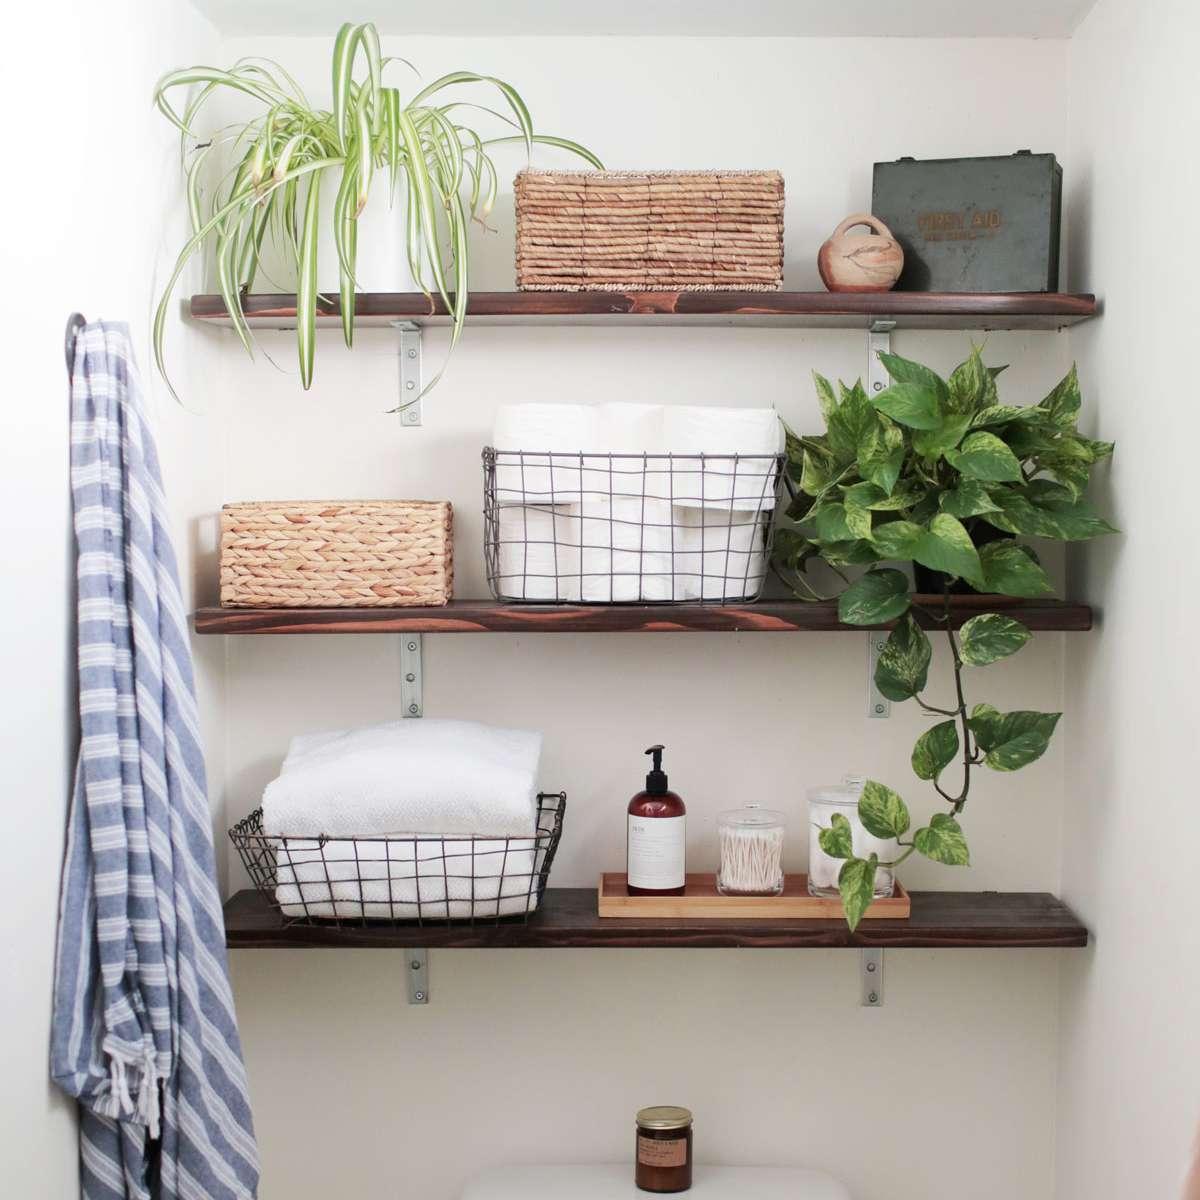 How To Make A Spa Bathroom At Home 25, Spa Bathroom Decor Ideas